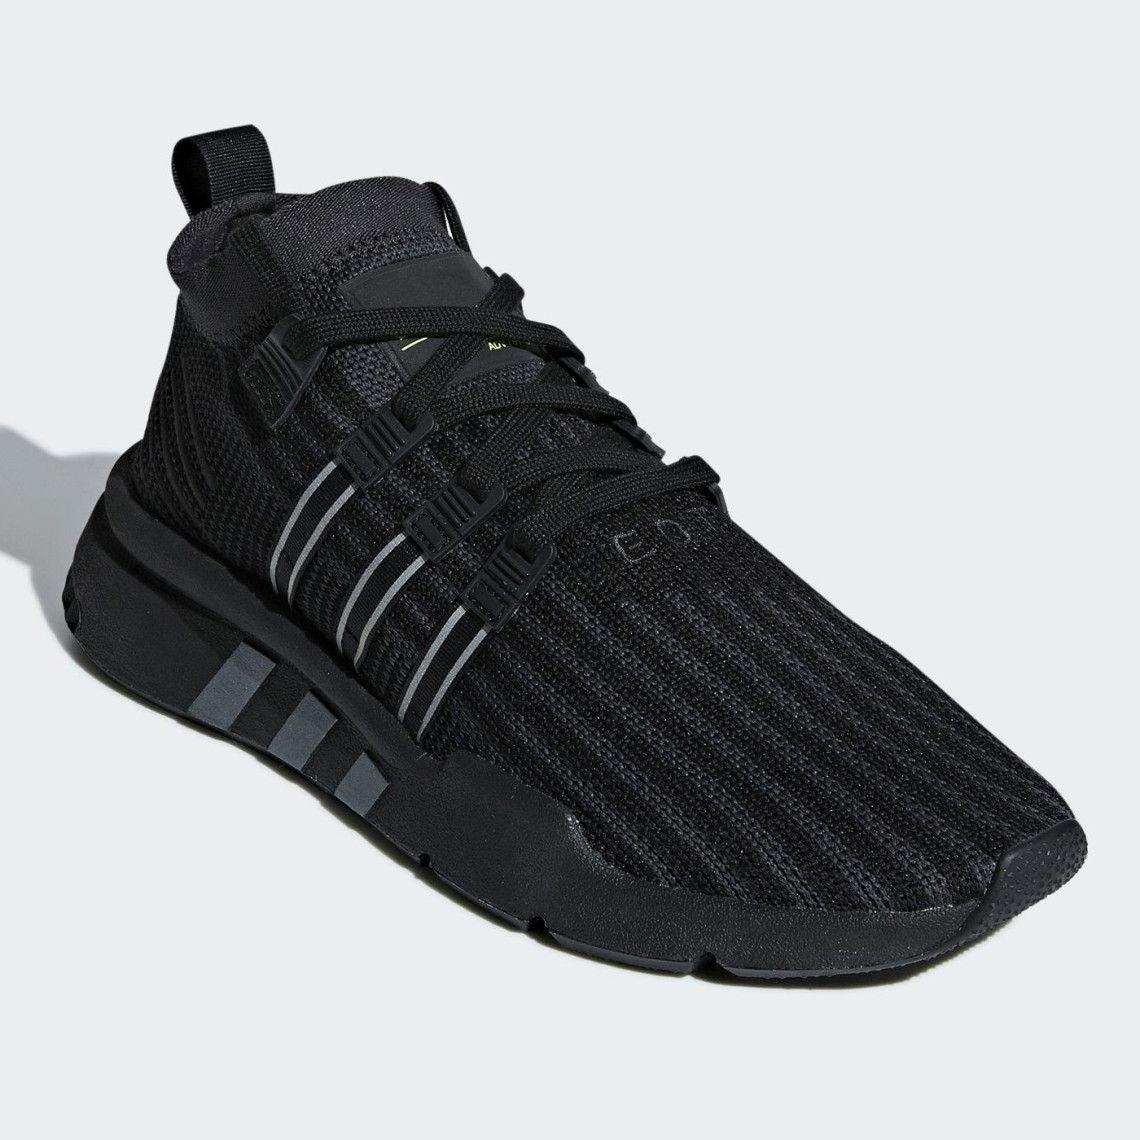 sports shoes 3c42f aa031 adidas EQT Support ADV Mid B37456 B37455  SneakerNews.com